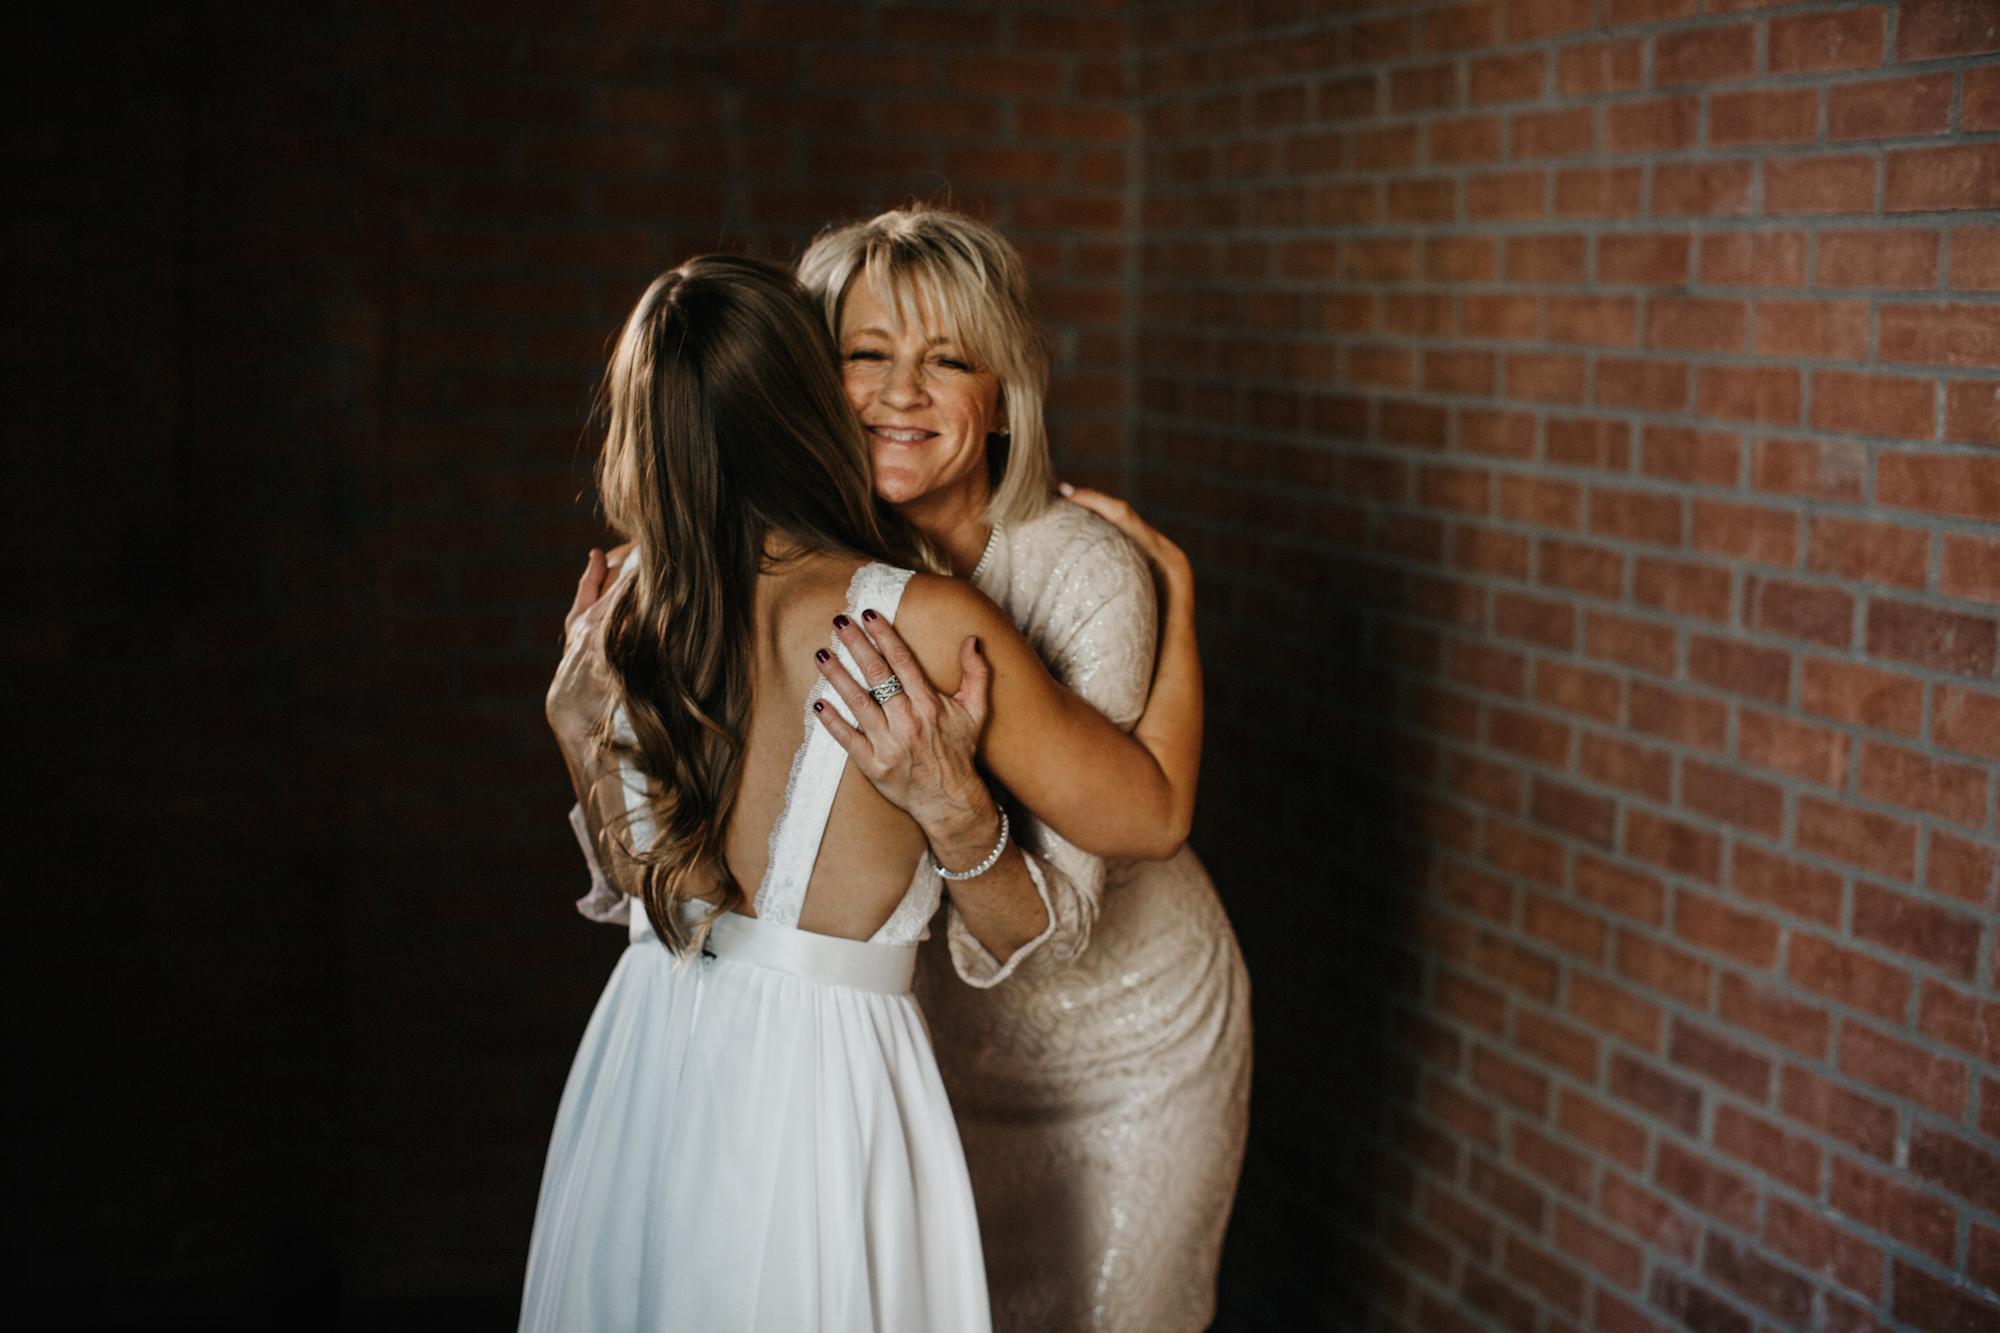 arizona - wedding - photographer 185.jpg